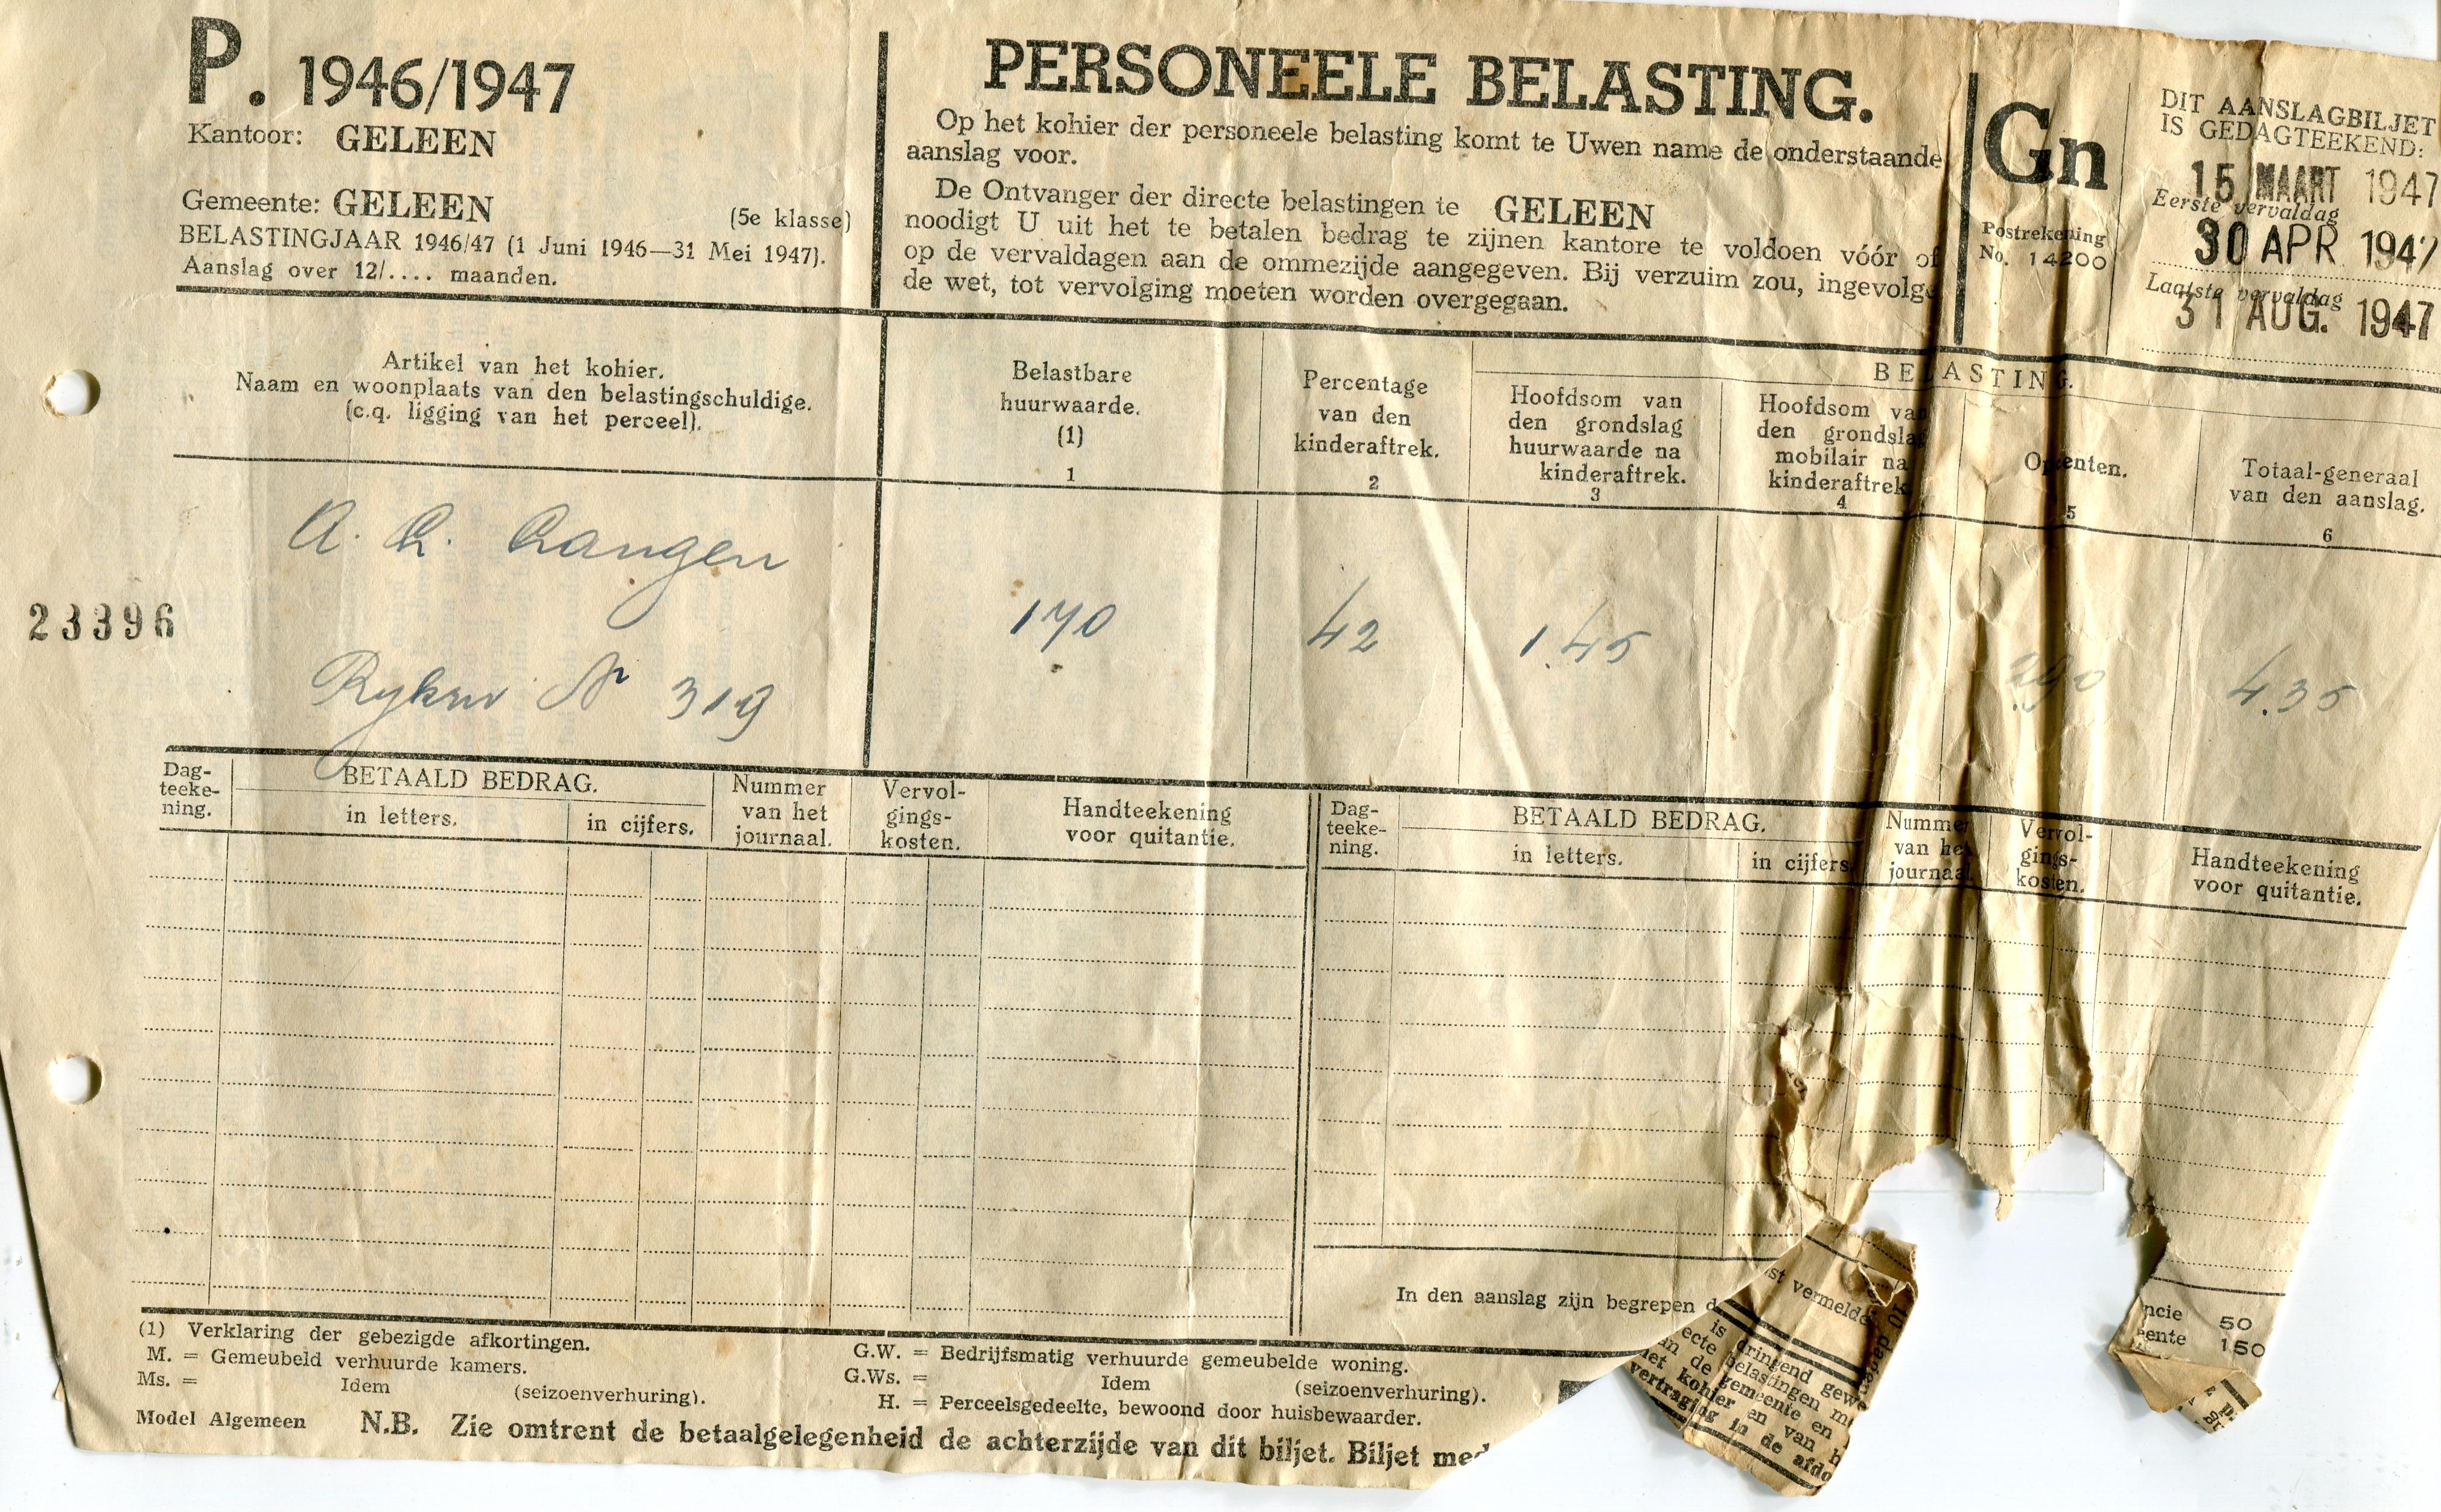 1947--Personele-belasting